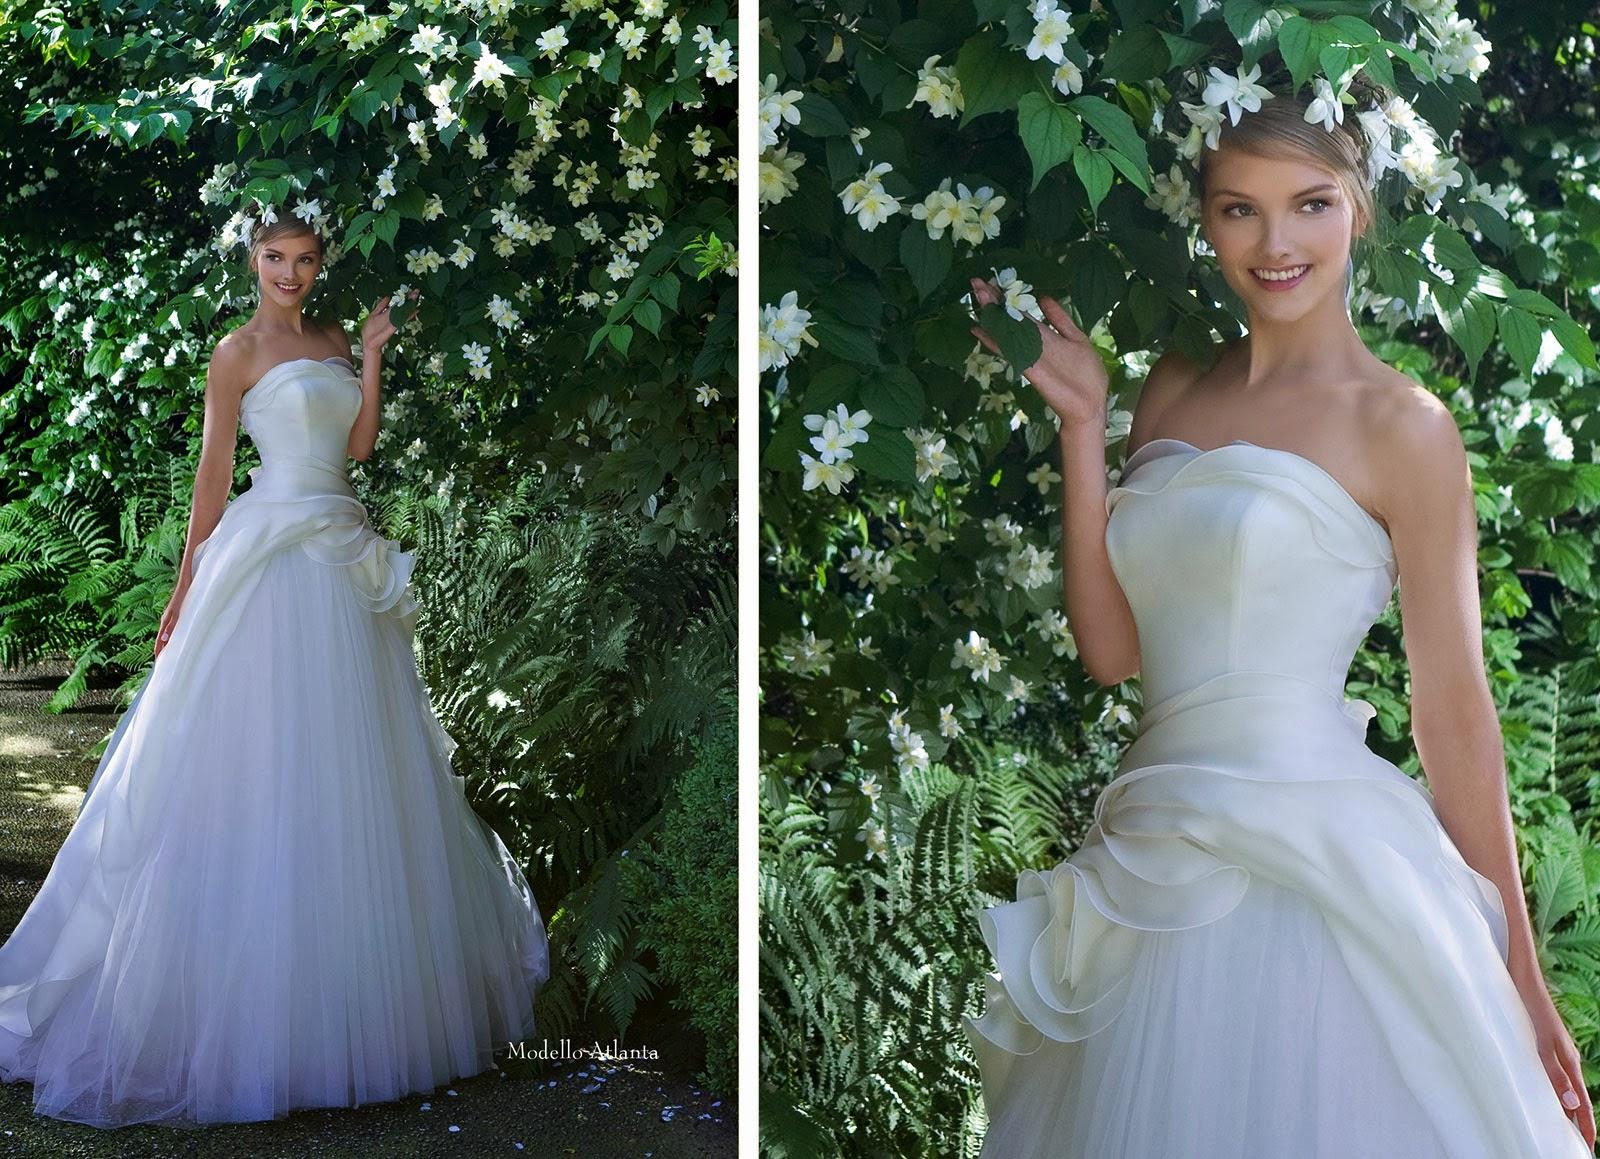 Asombrosos vestidos de novia colecci n giardini paghera for Paghera giardini